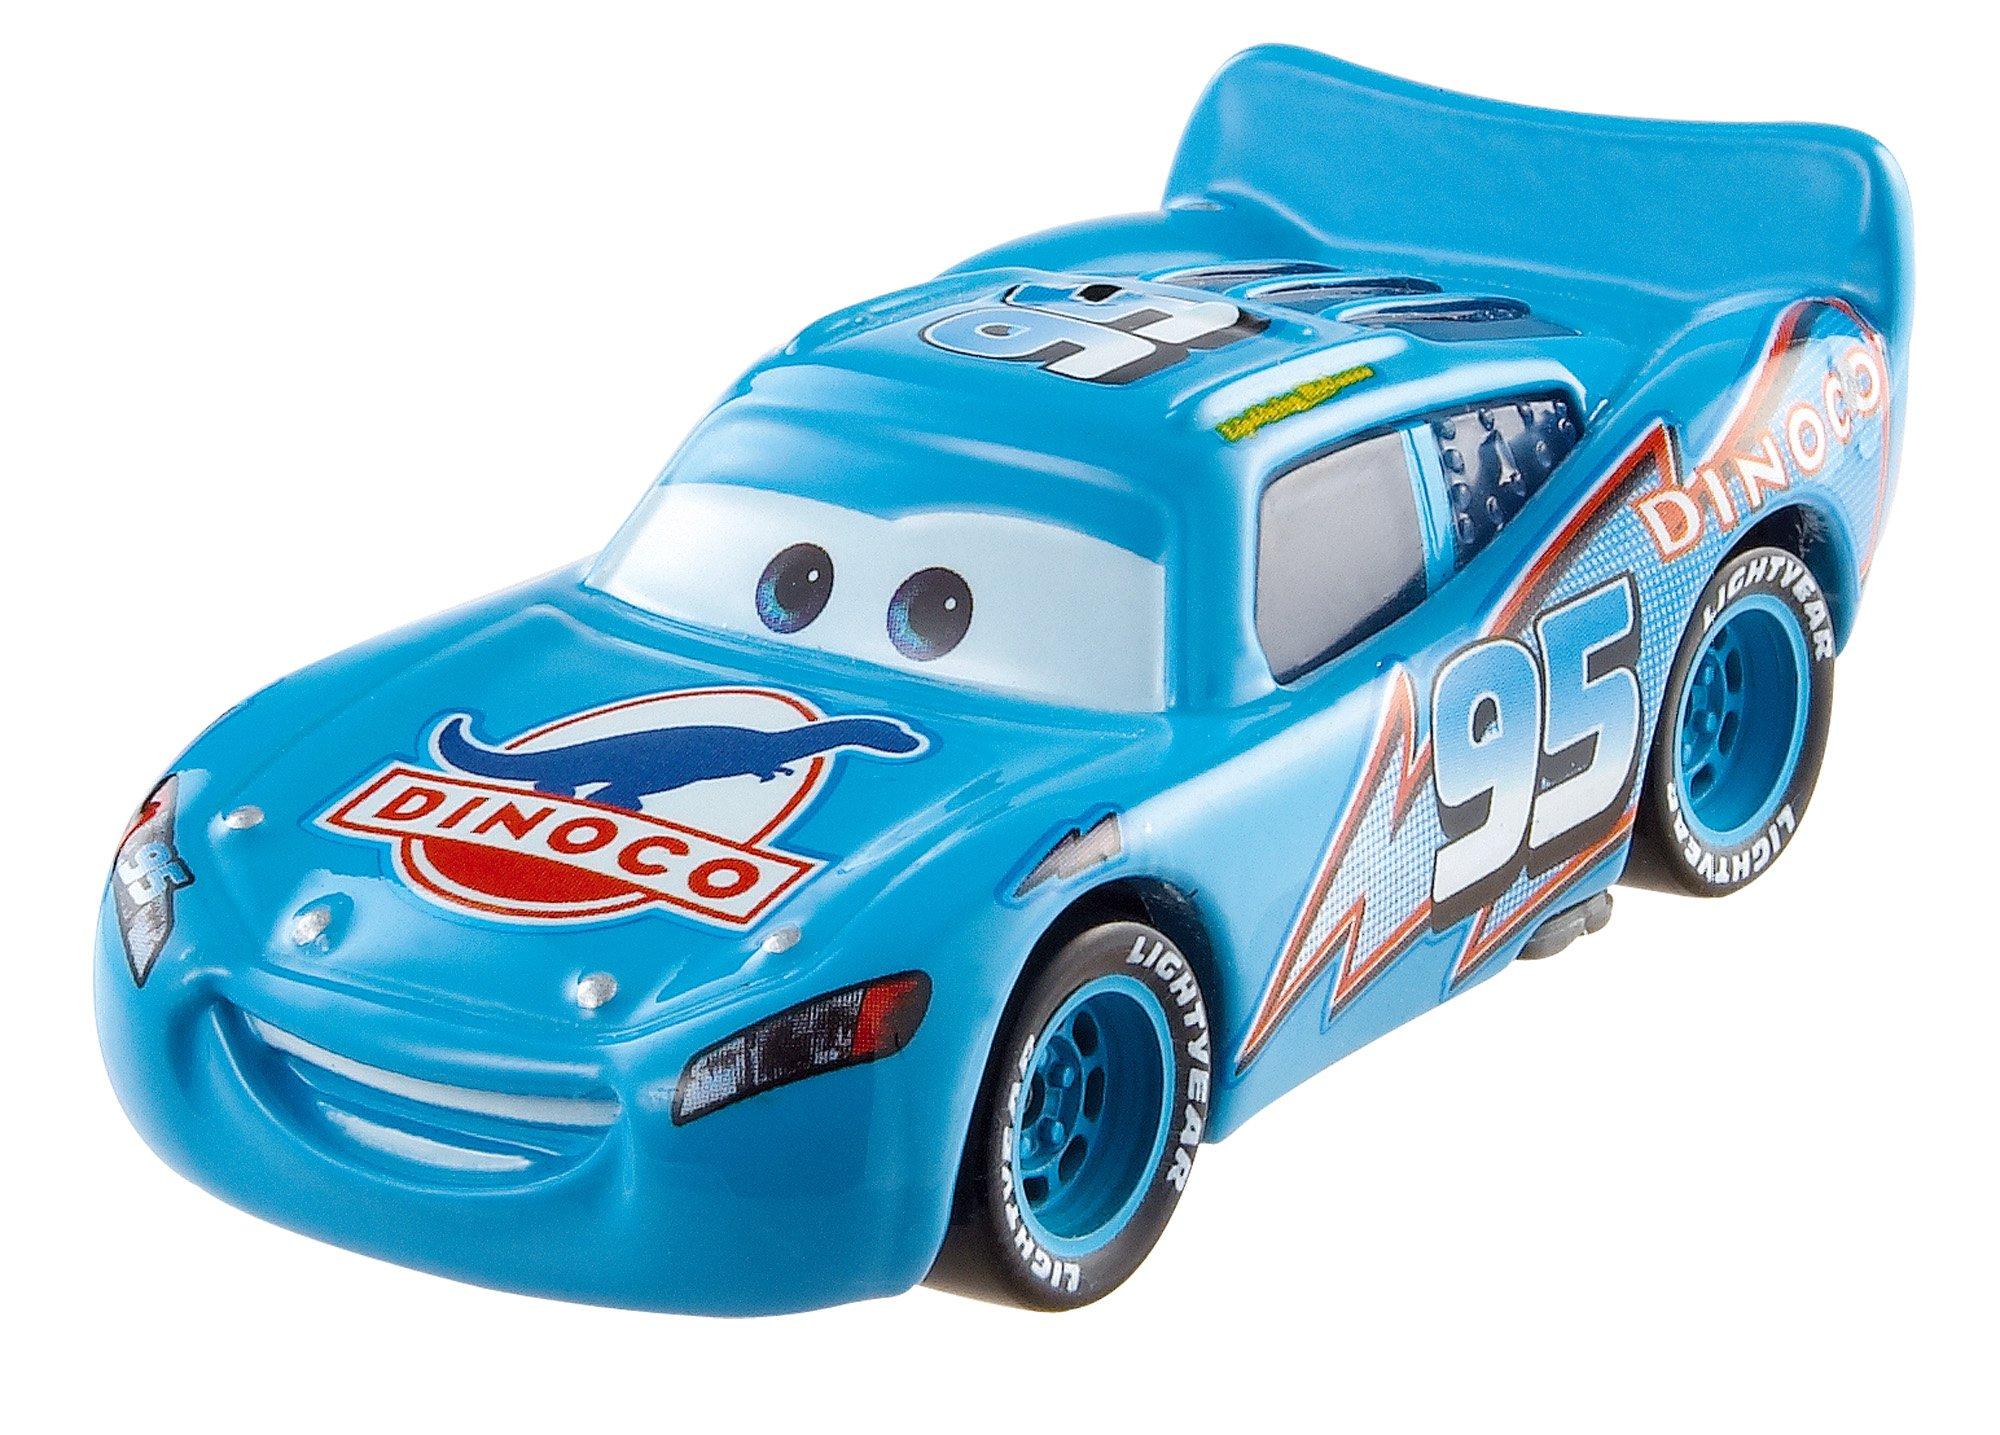 Disney Pixar Cars Pull Backs Dinoco Lightning McQueen Vehicle